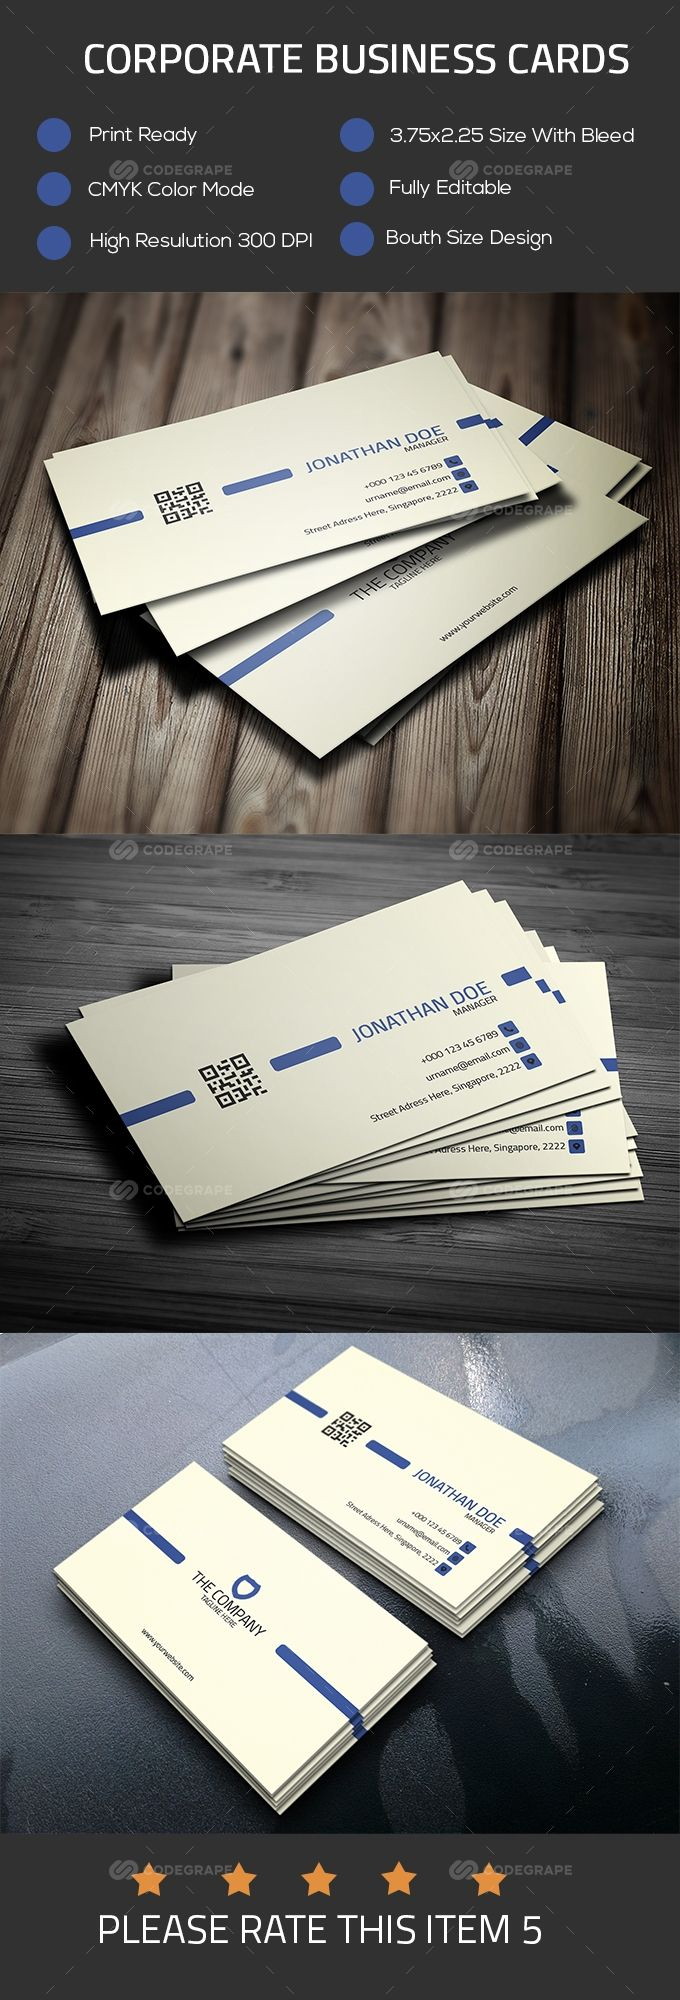 Corporate Business Card Corporate Business Card Printing Business Cards Corporate Business